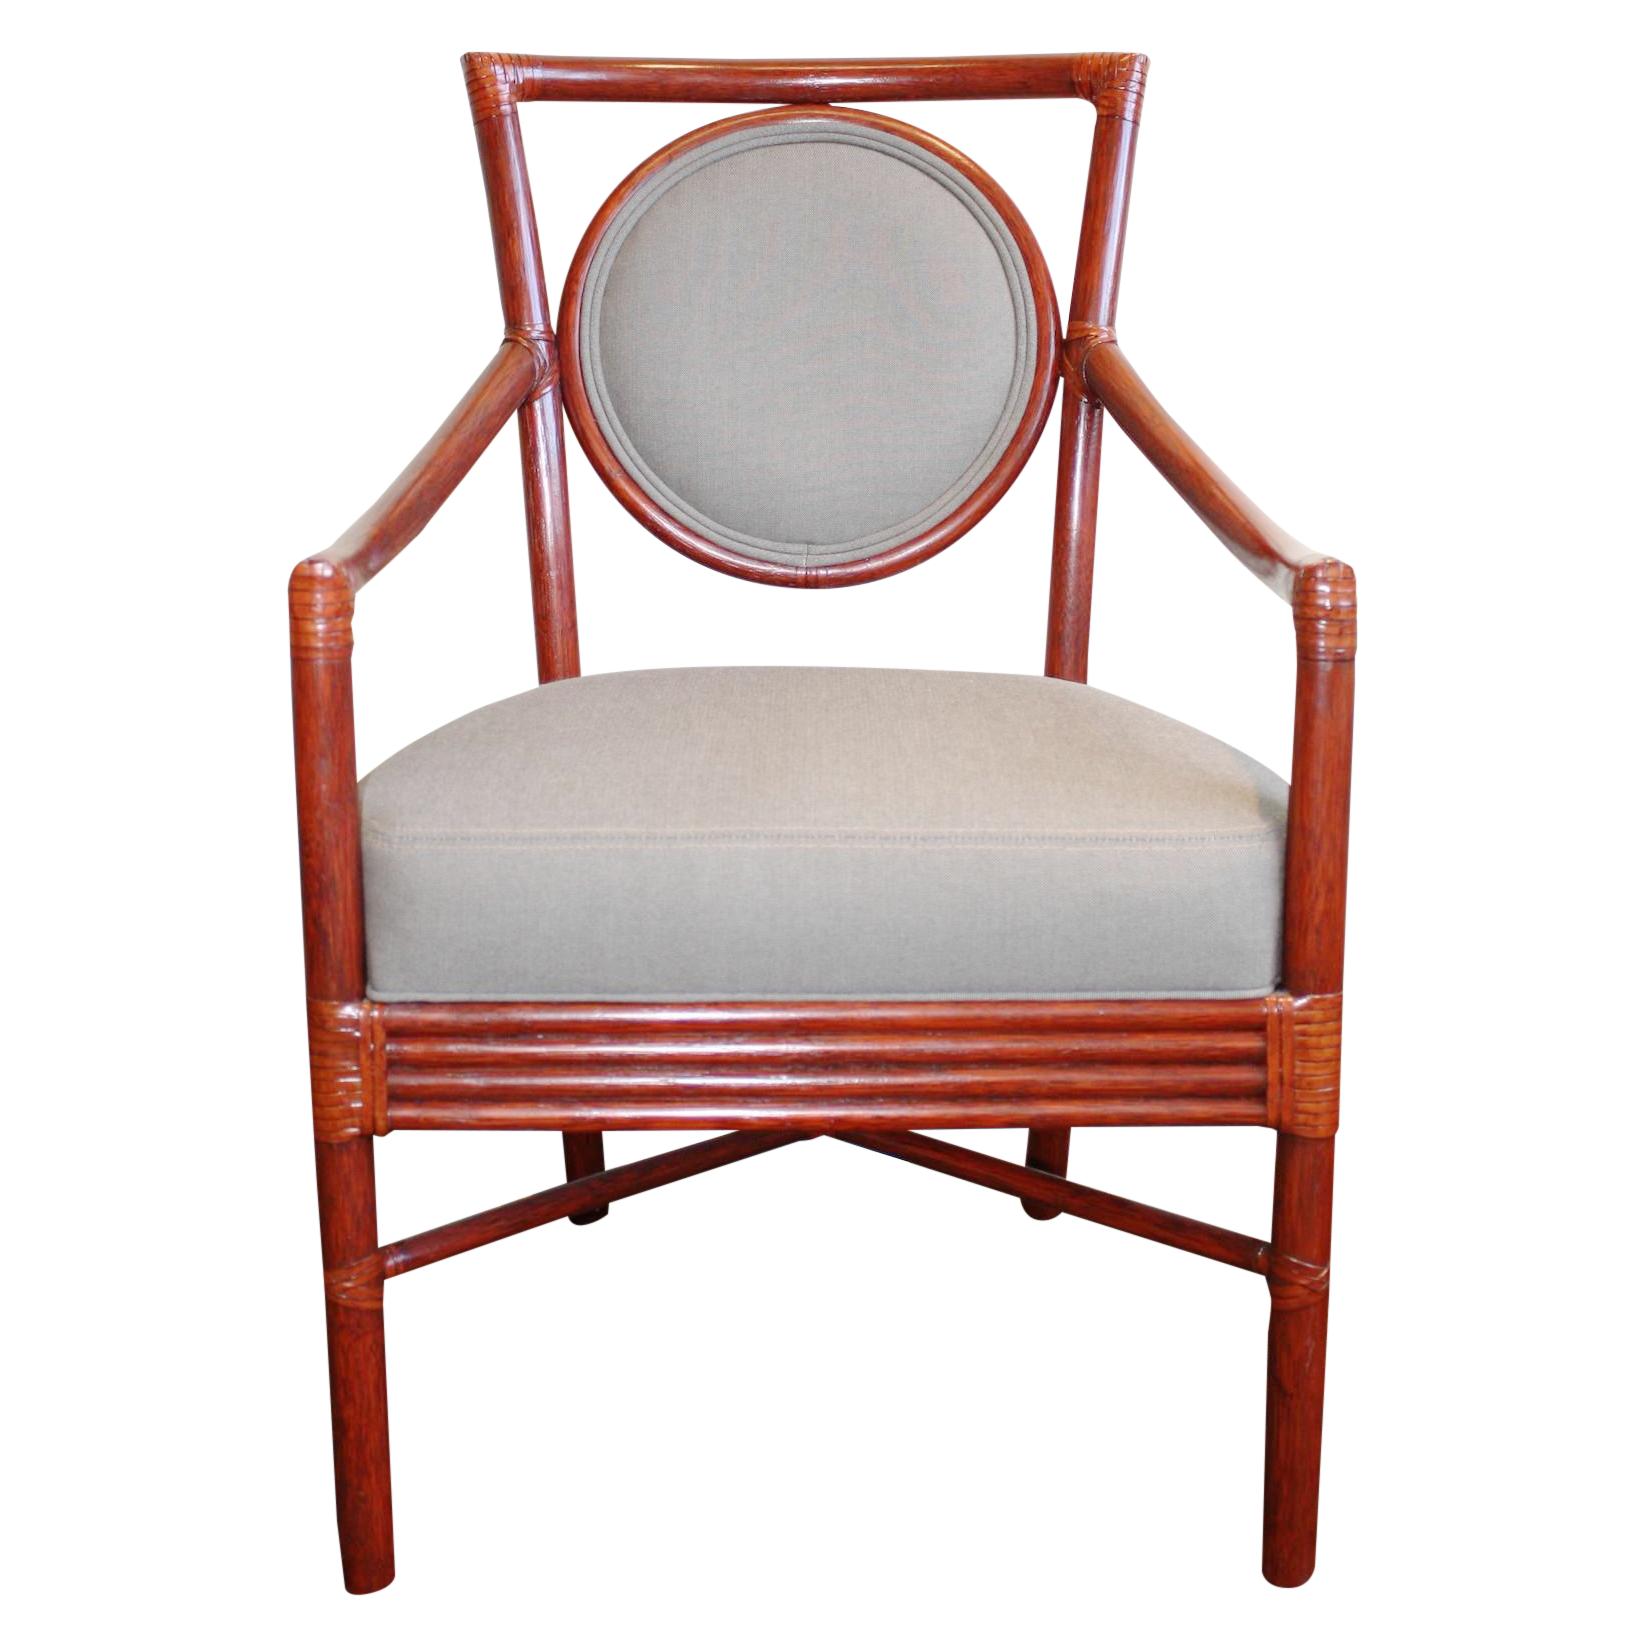 Mcguire Orlando Diaz Azcuy Salon Dining Arm Chair Chairish